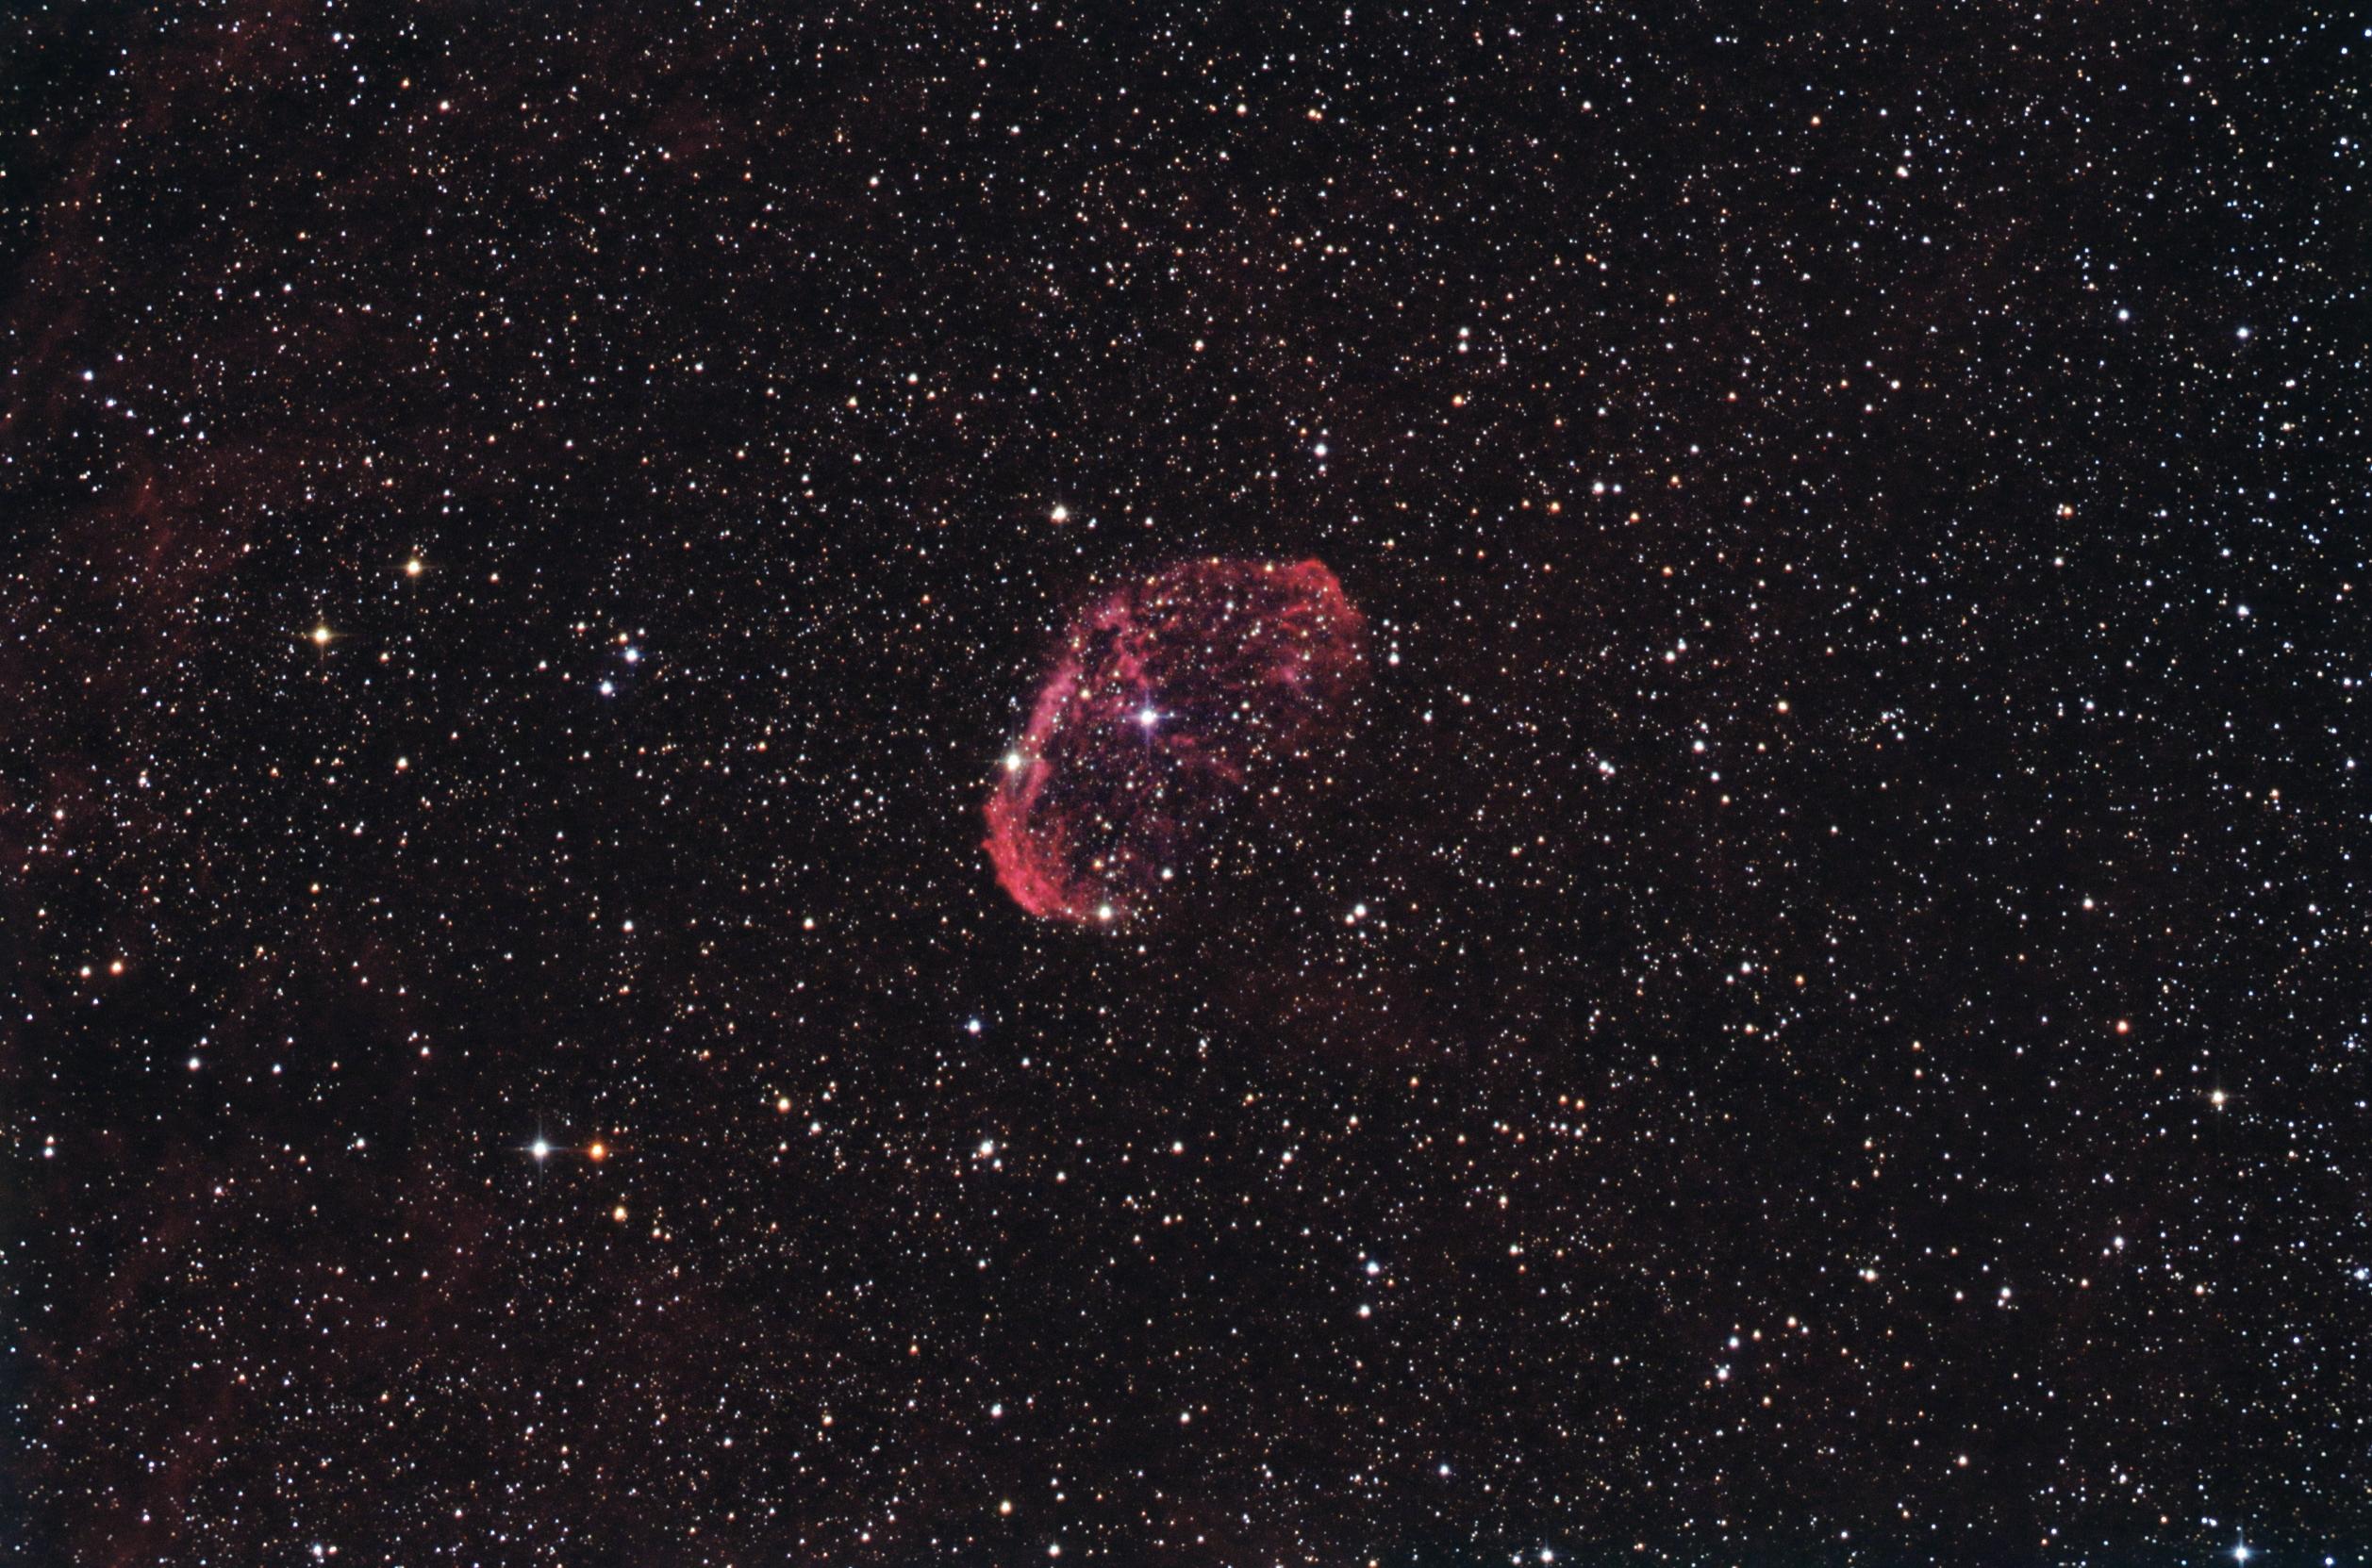 NGC6888-Nebuleuse du croissant-30min-DPP-DSS-PS2+FFC-Ha13x10mn-RVB10x3mn